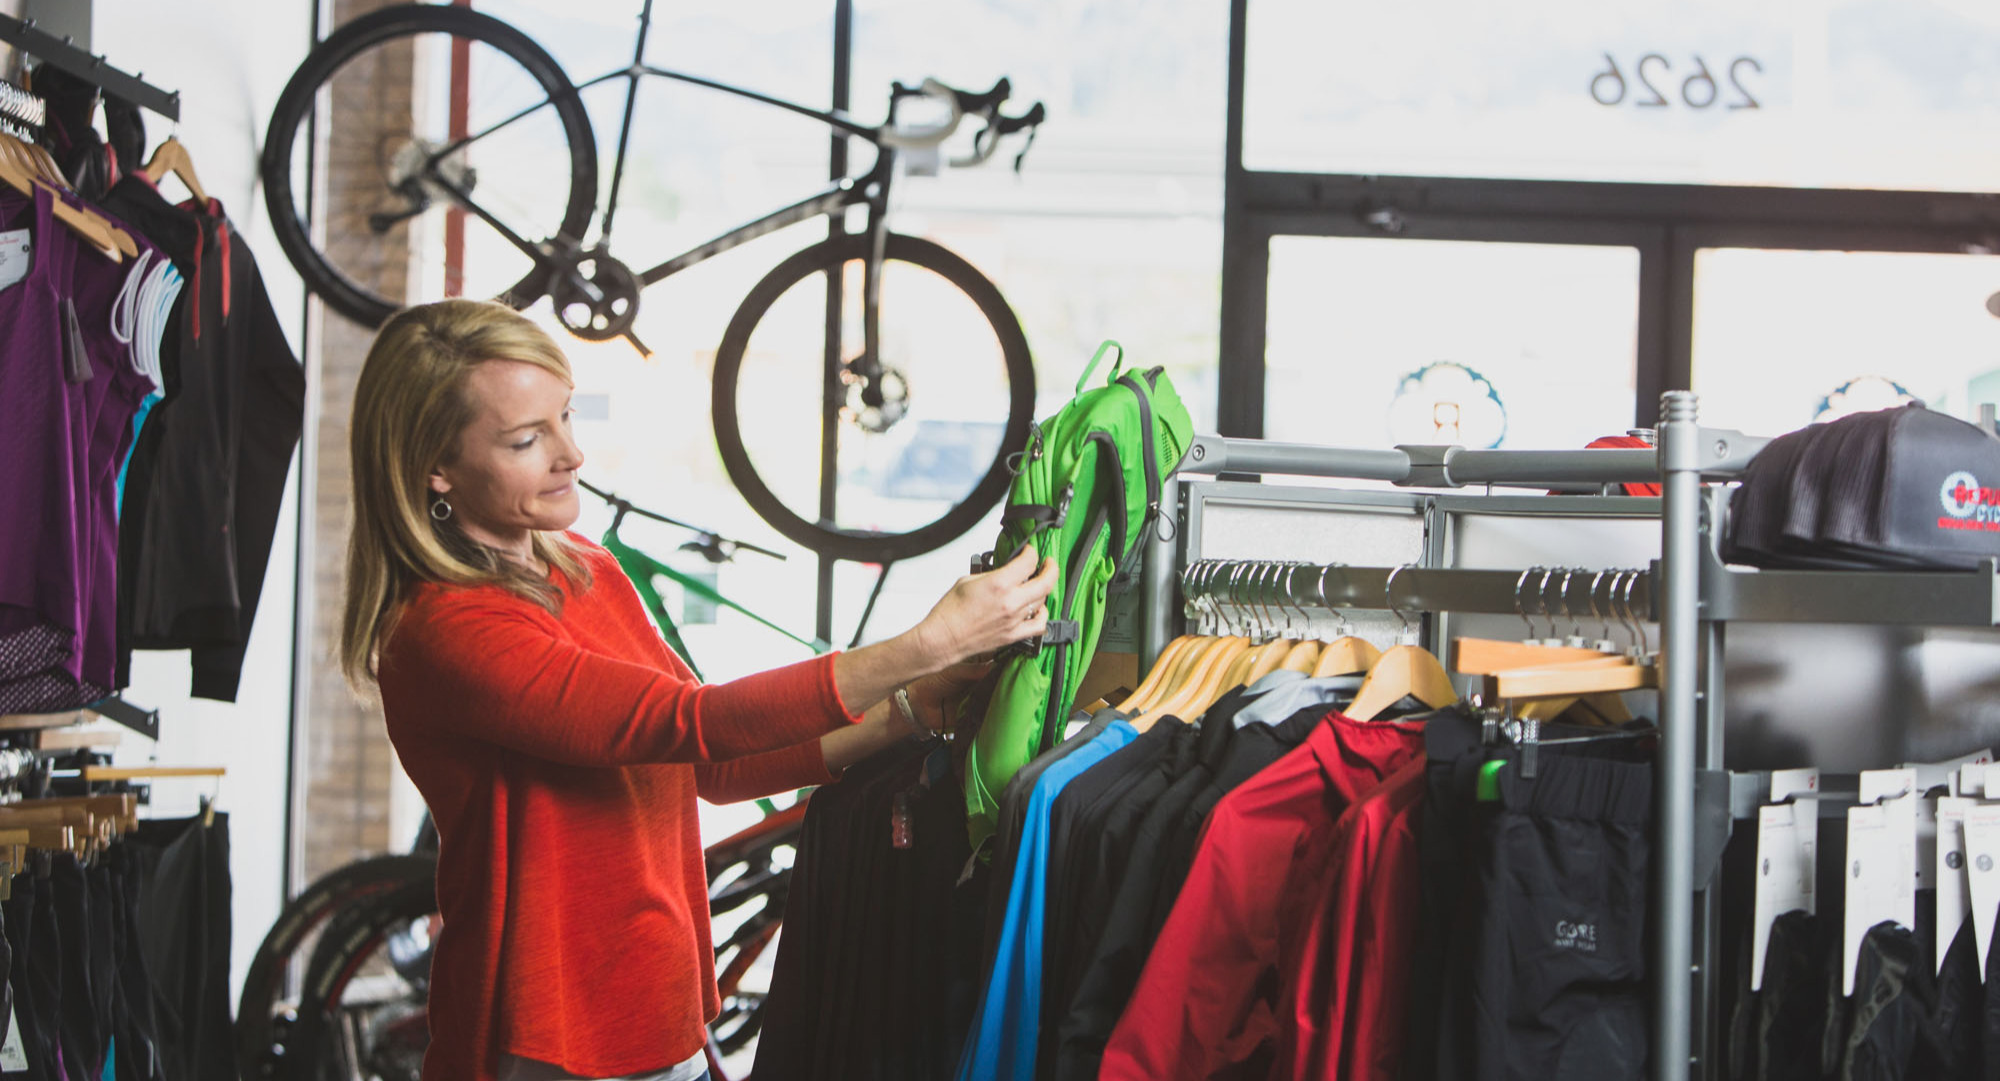 Woman looking at cycling jersey